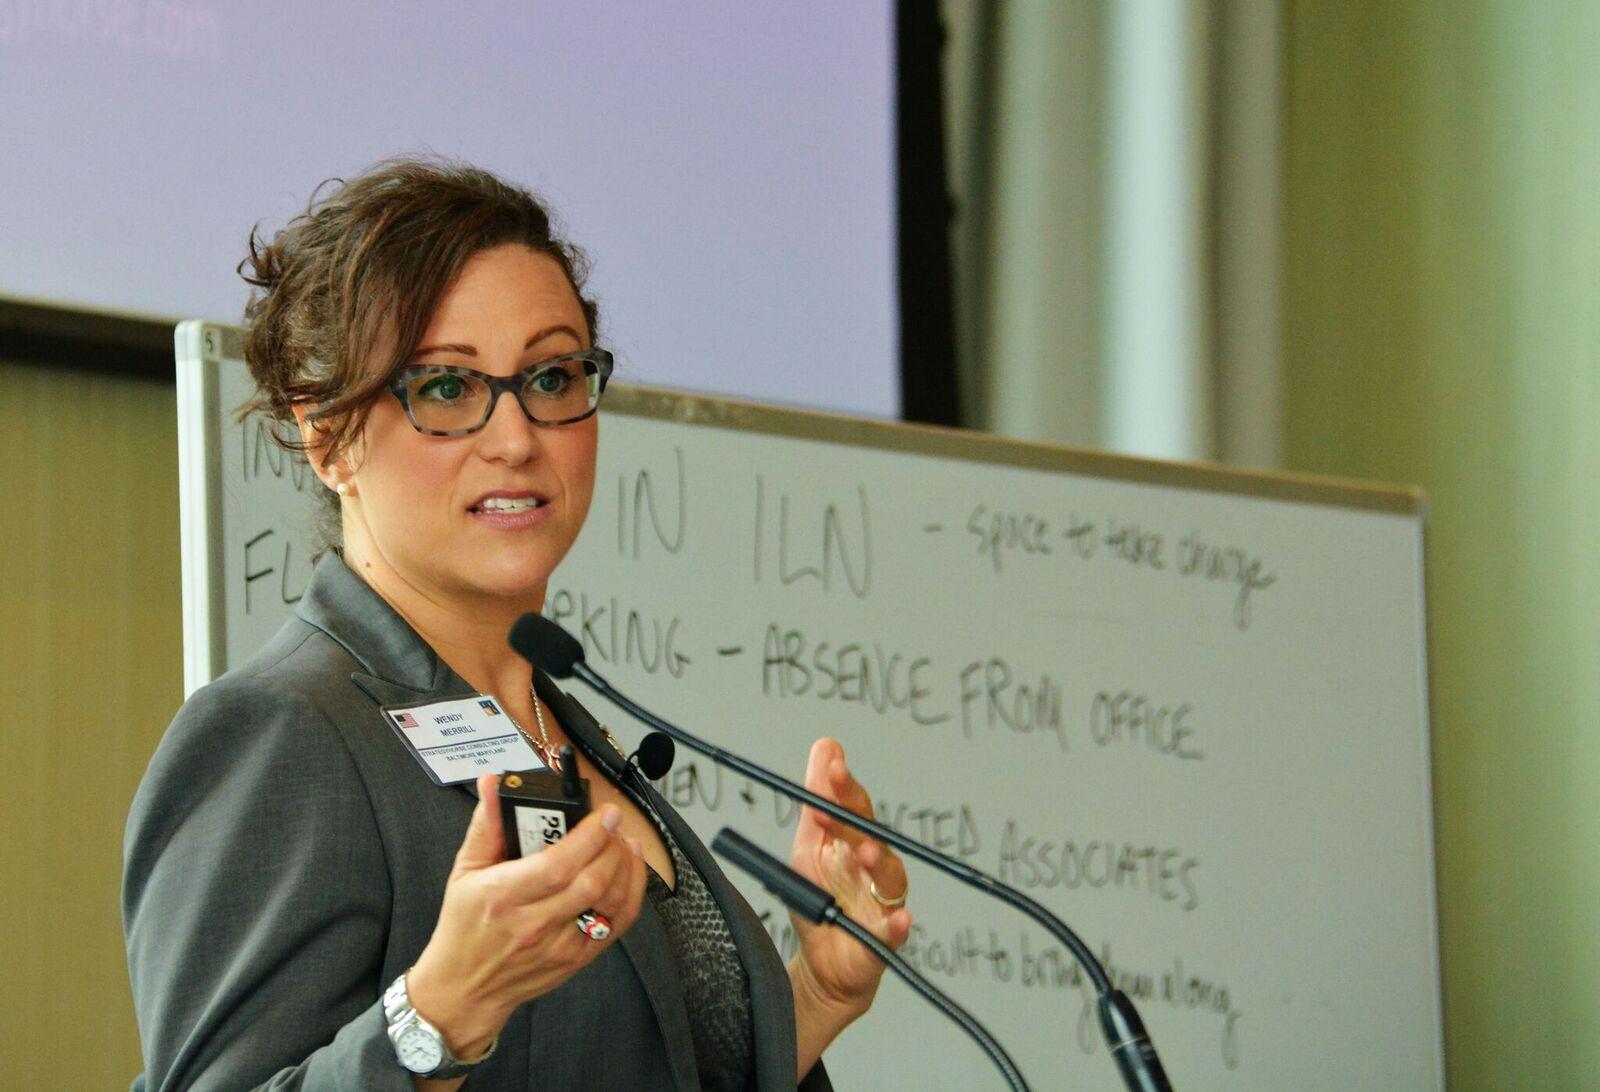 Wendy presenting to ILN members.